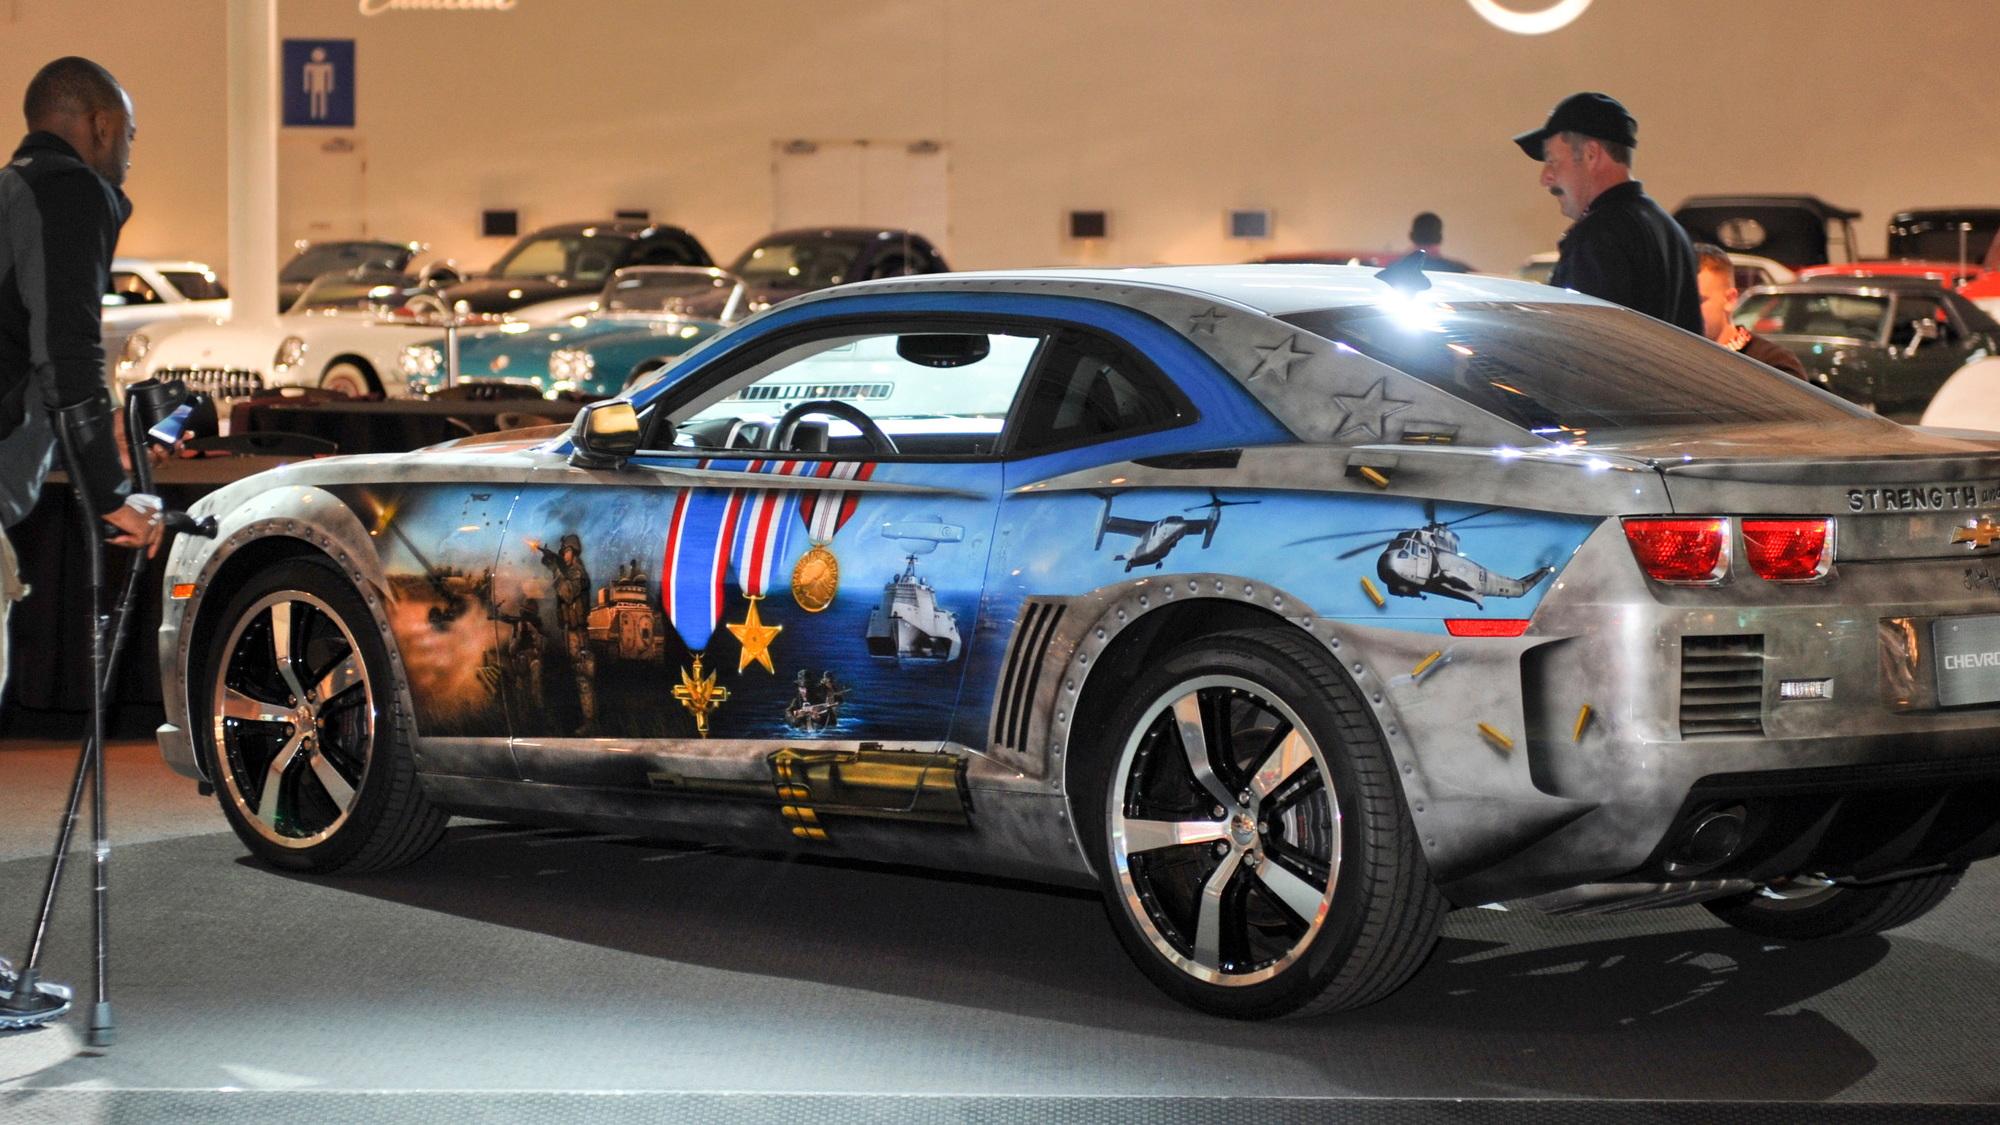 The Military Tribute Edition Chevrolet Camaro